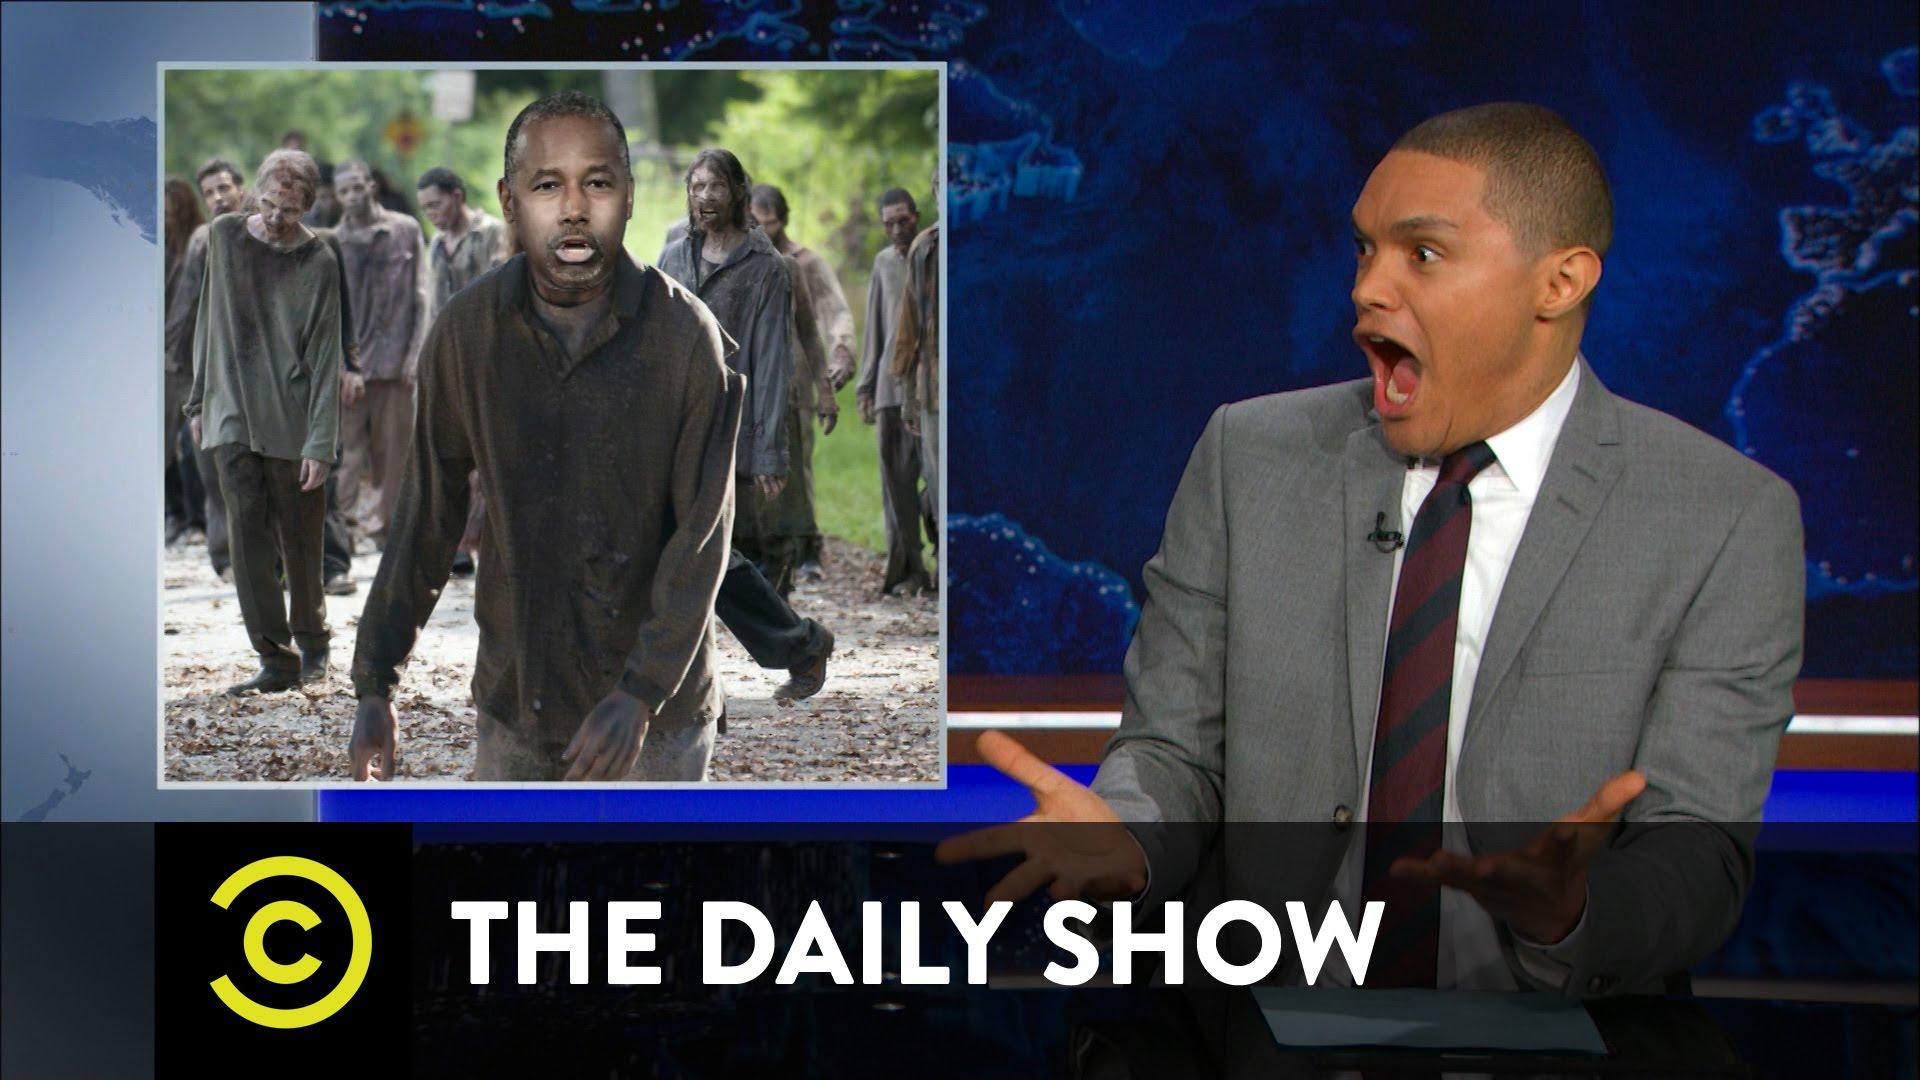 The Daily Show with Trevor Noah - Ben Carson Blames the Victims - Nehanda TV